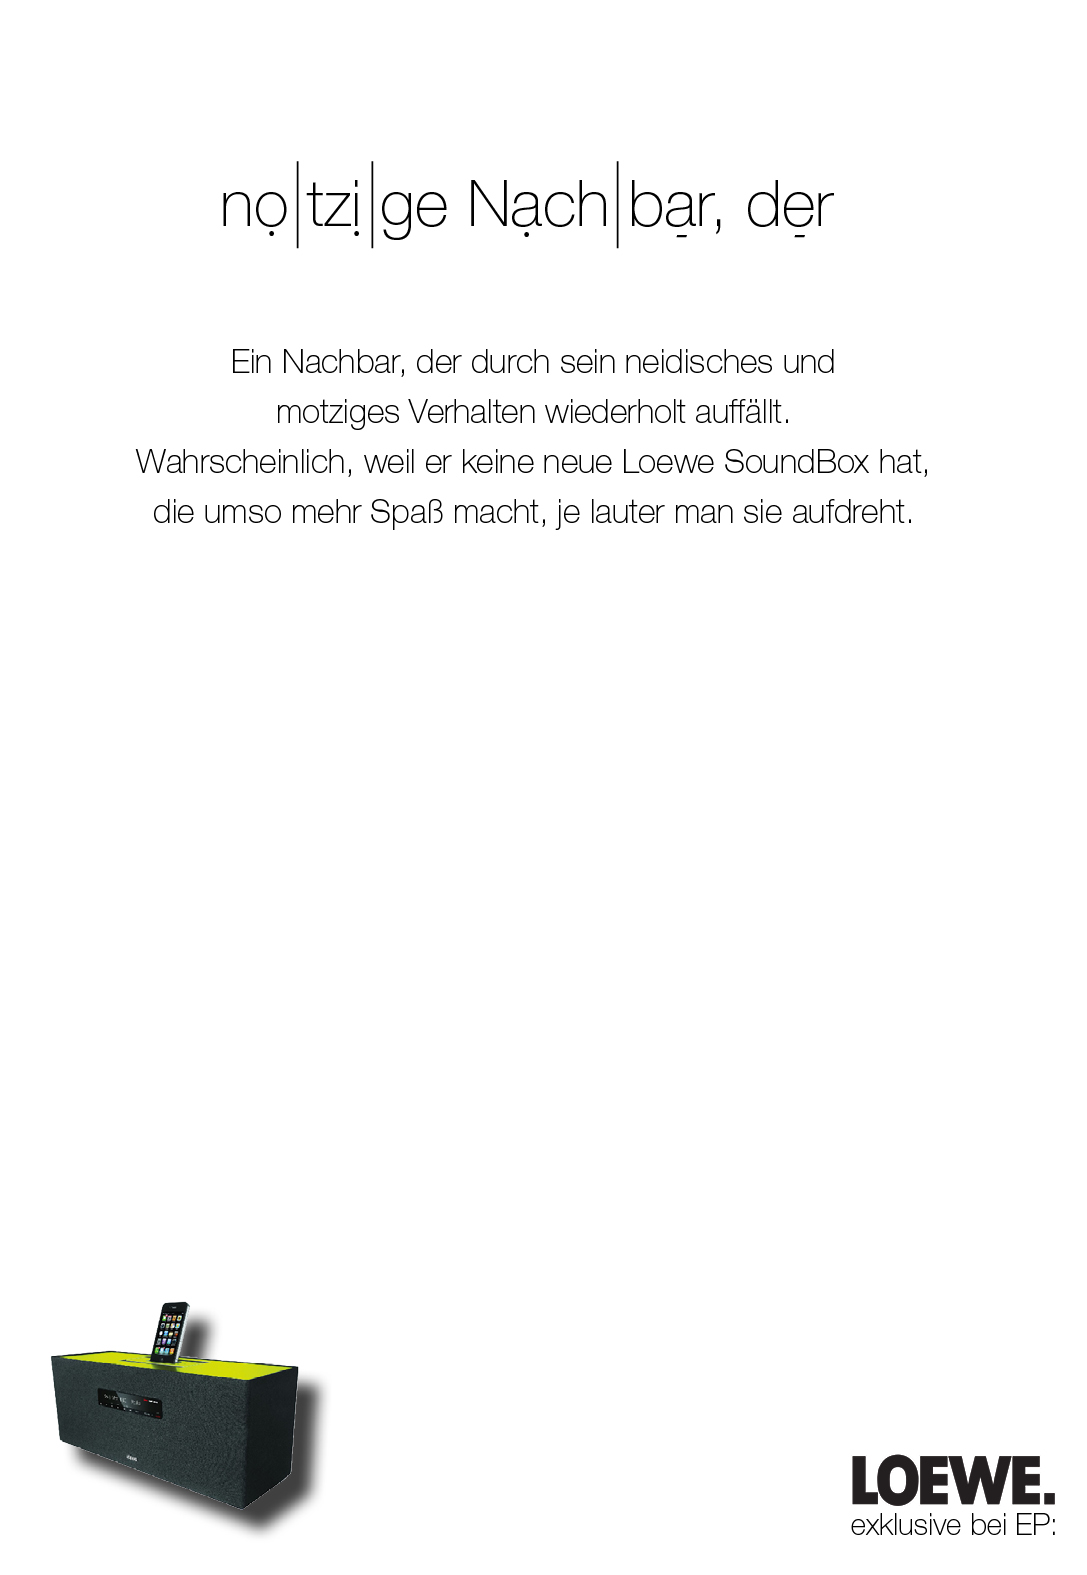 OVB_Loewe-Lexikon.jpg